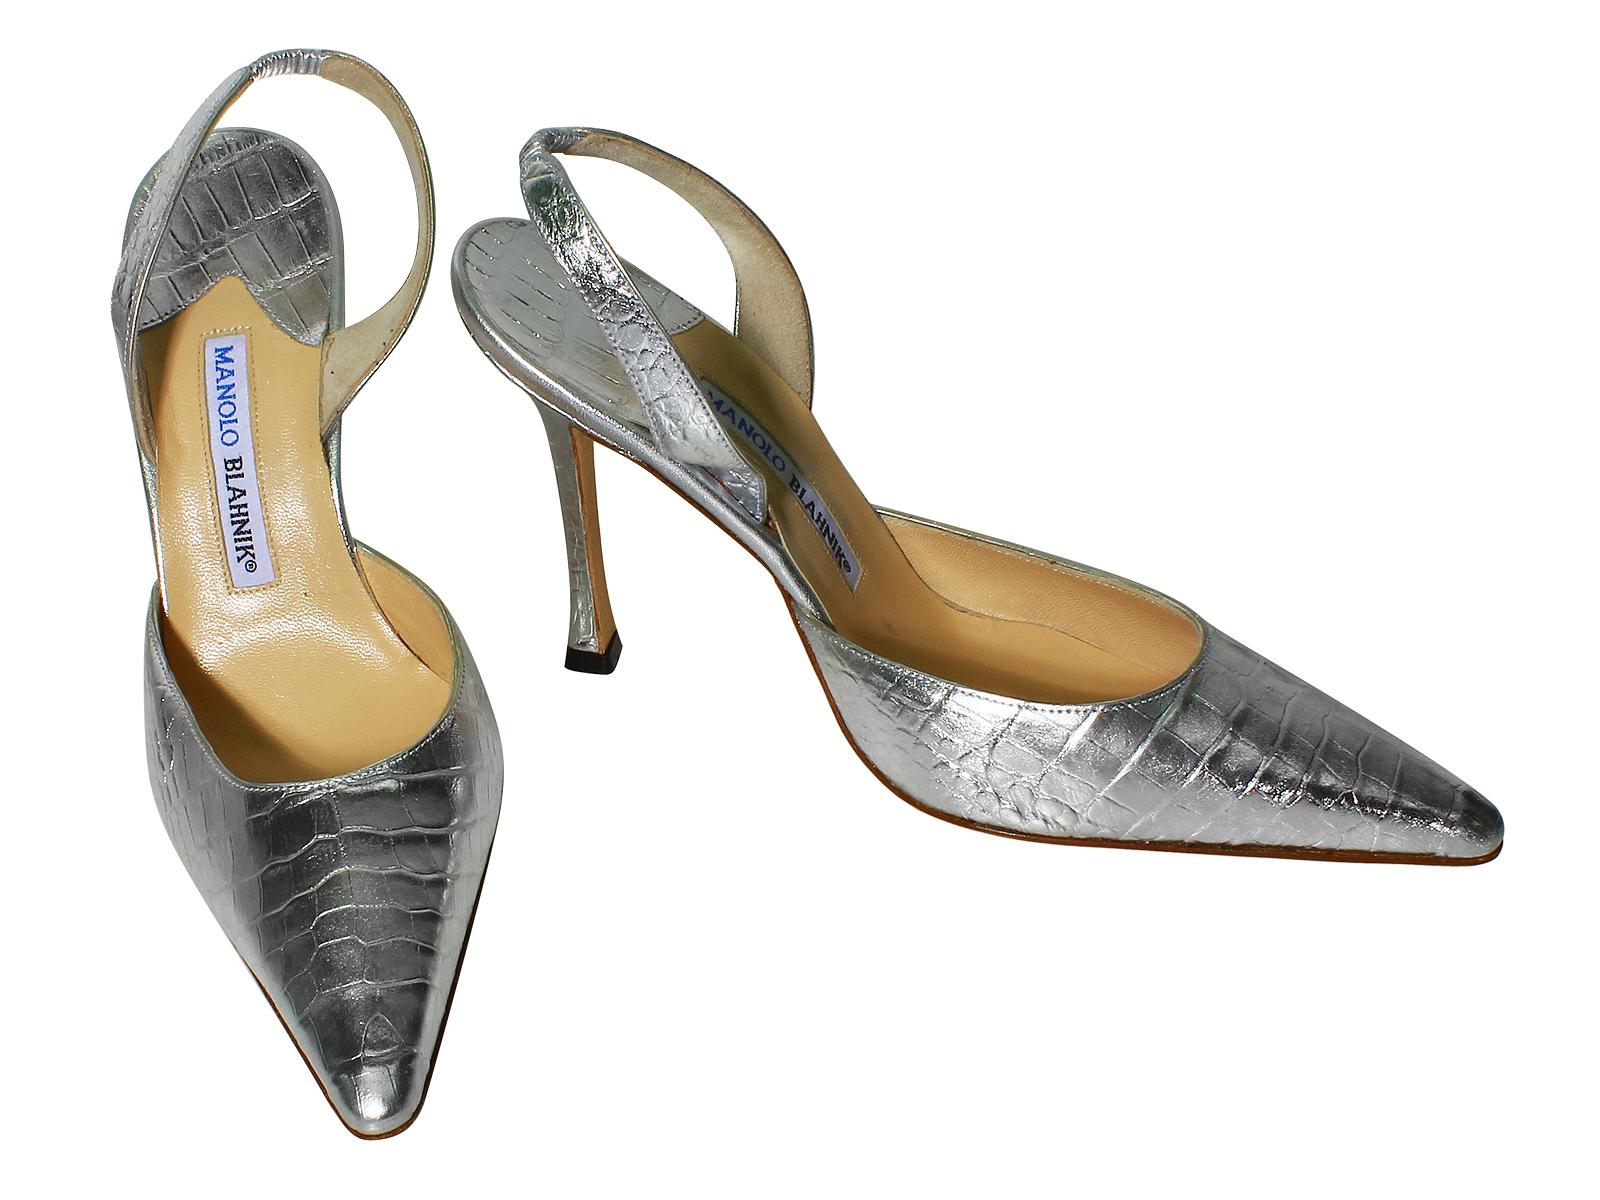 13ddeb98fa6 623.0. 623.0. Previous. MANOLO BLAHNIK Carolyne Crocodile Shoes Size 39.5  Color Silver L623